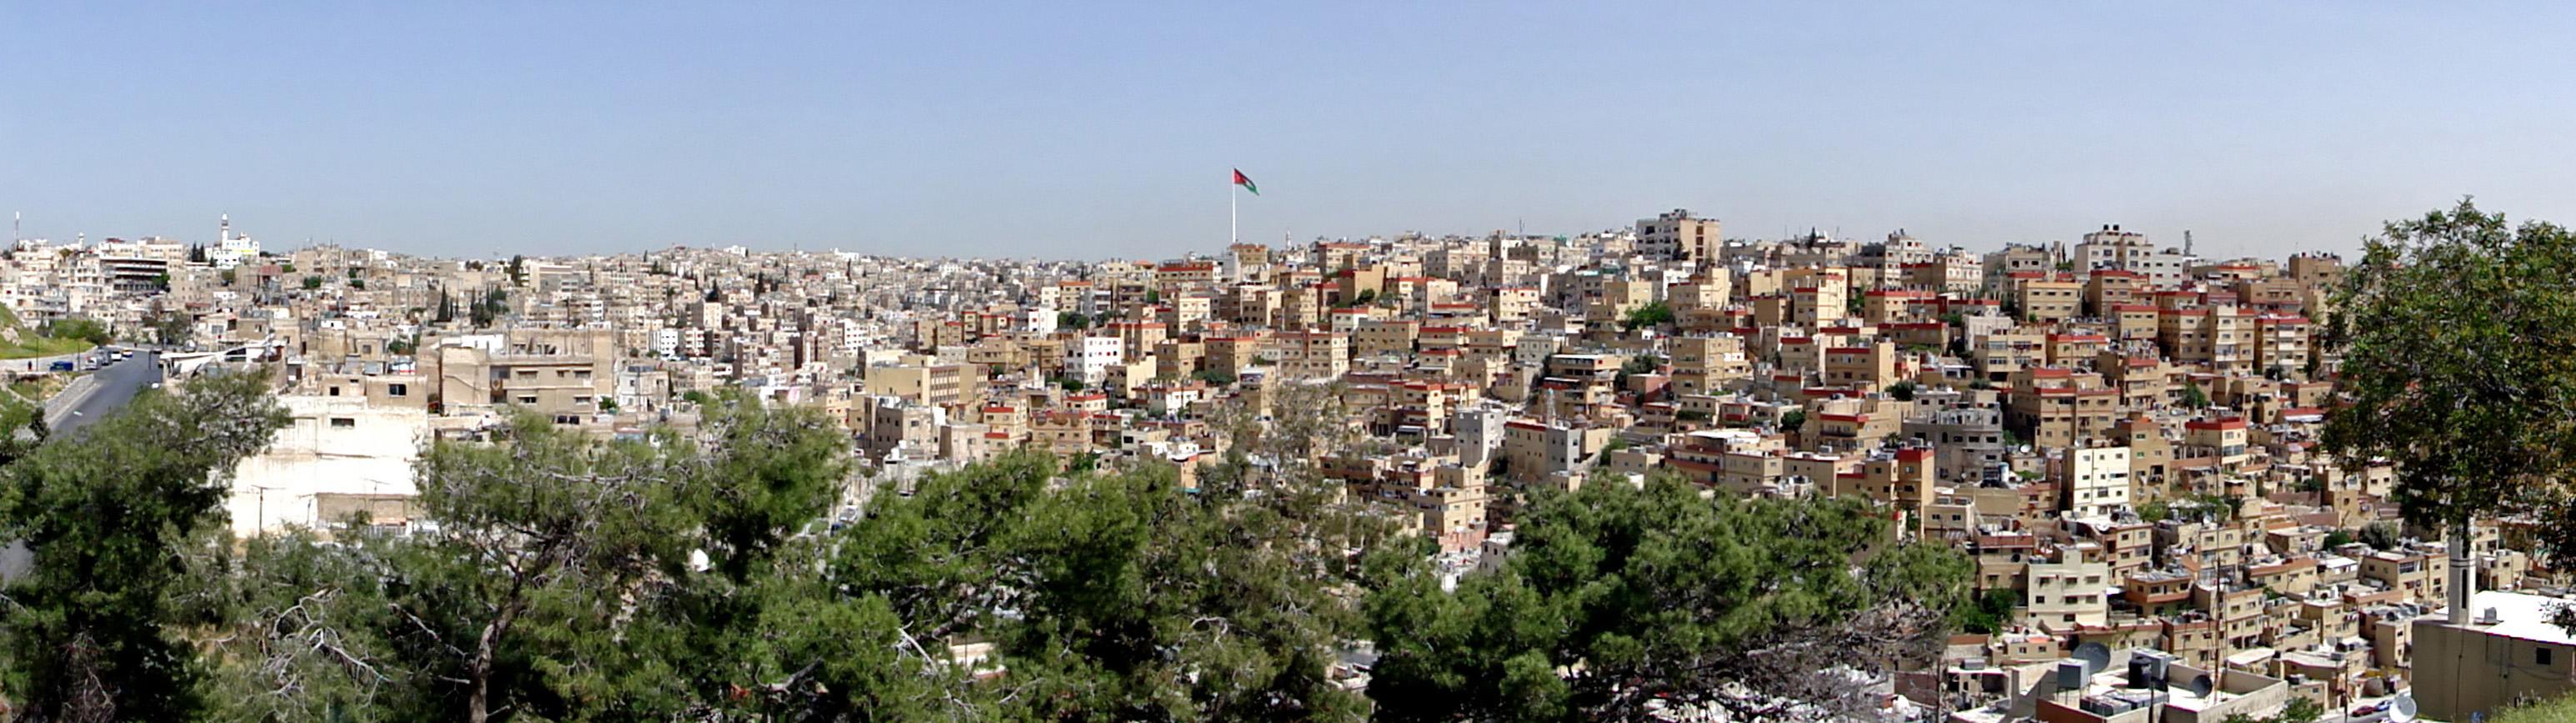 jordan 23 google office. GAMEON-ARABIA\u00272016, March 21-23, 2016, AOU, Amman, Jordan, Conference Venue Jordan 23 Google Office